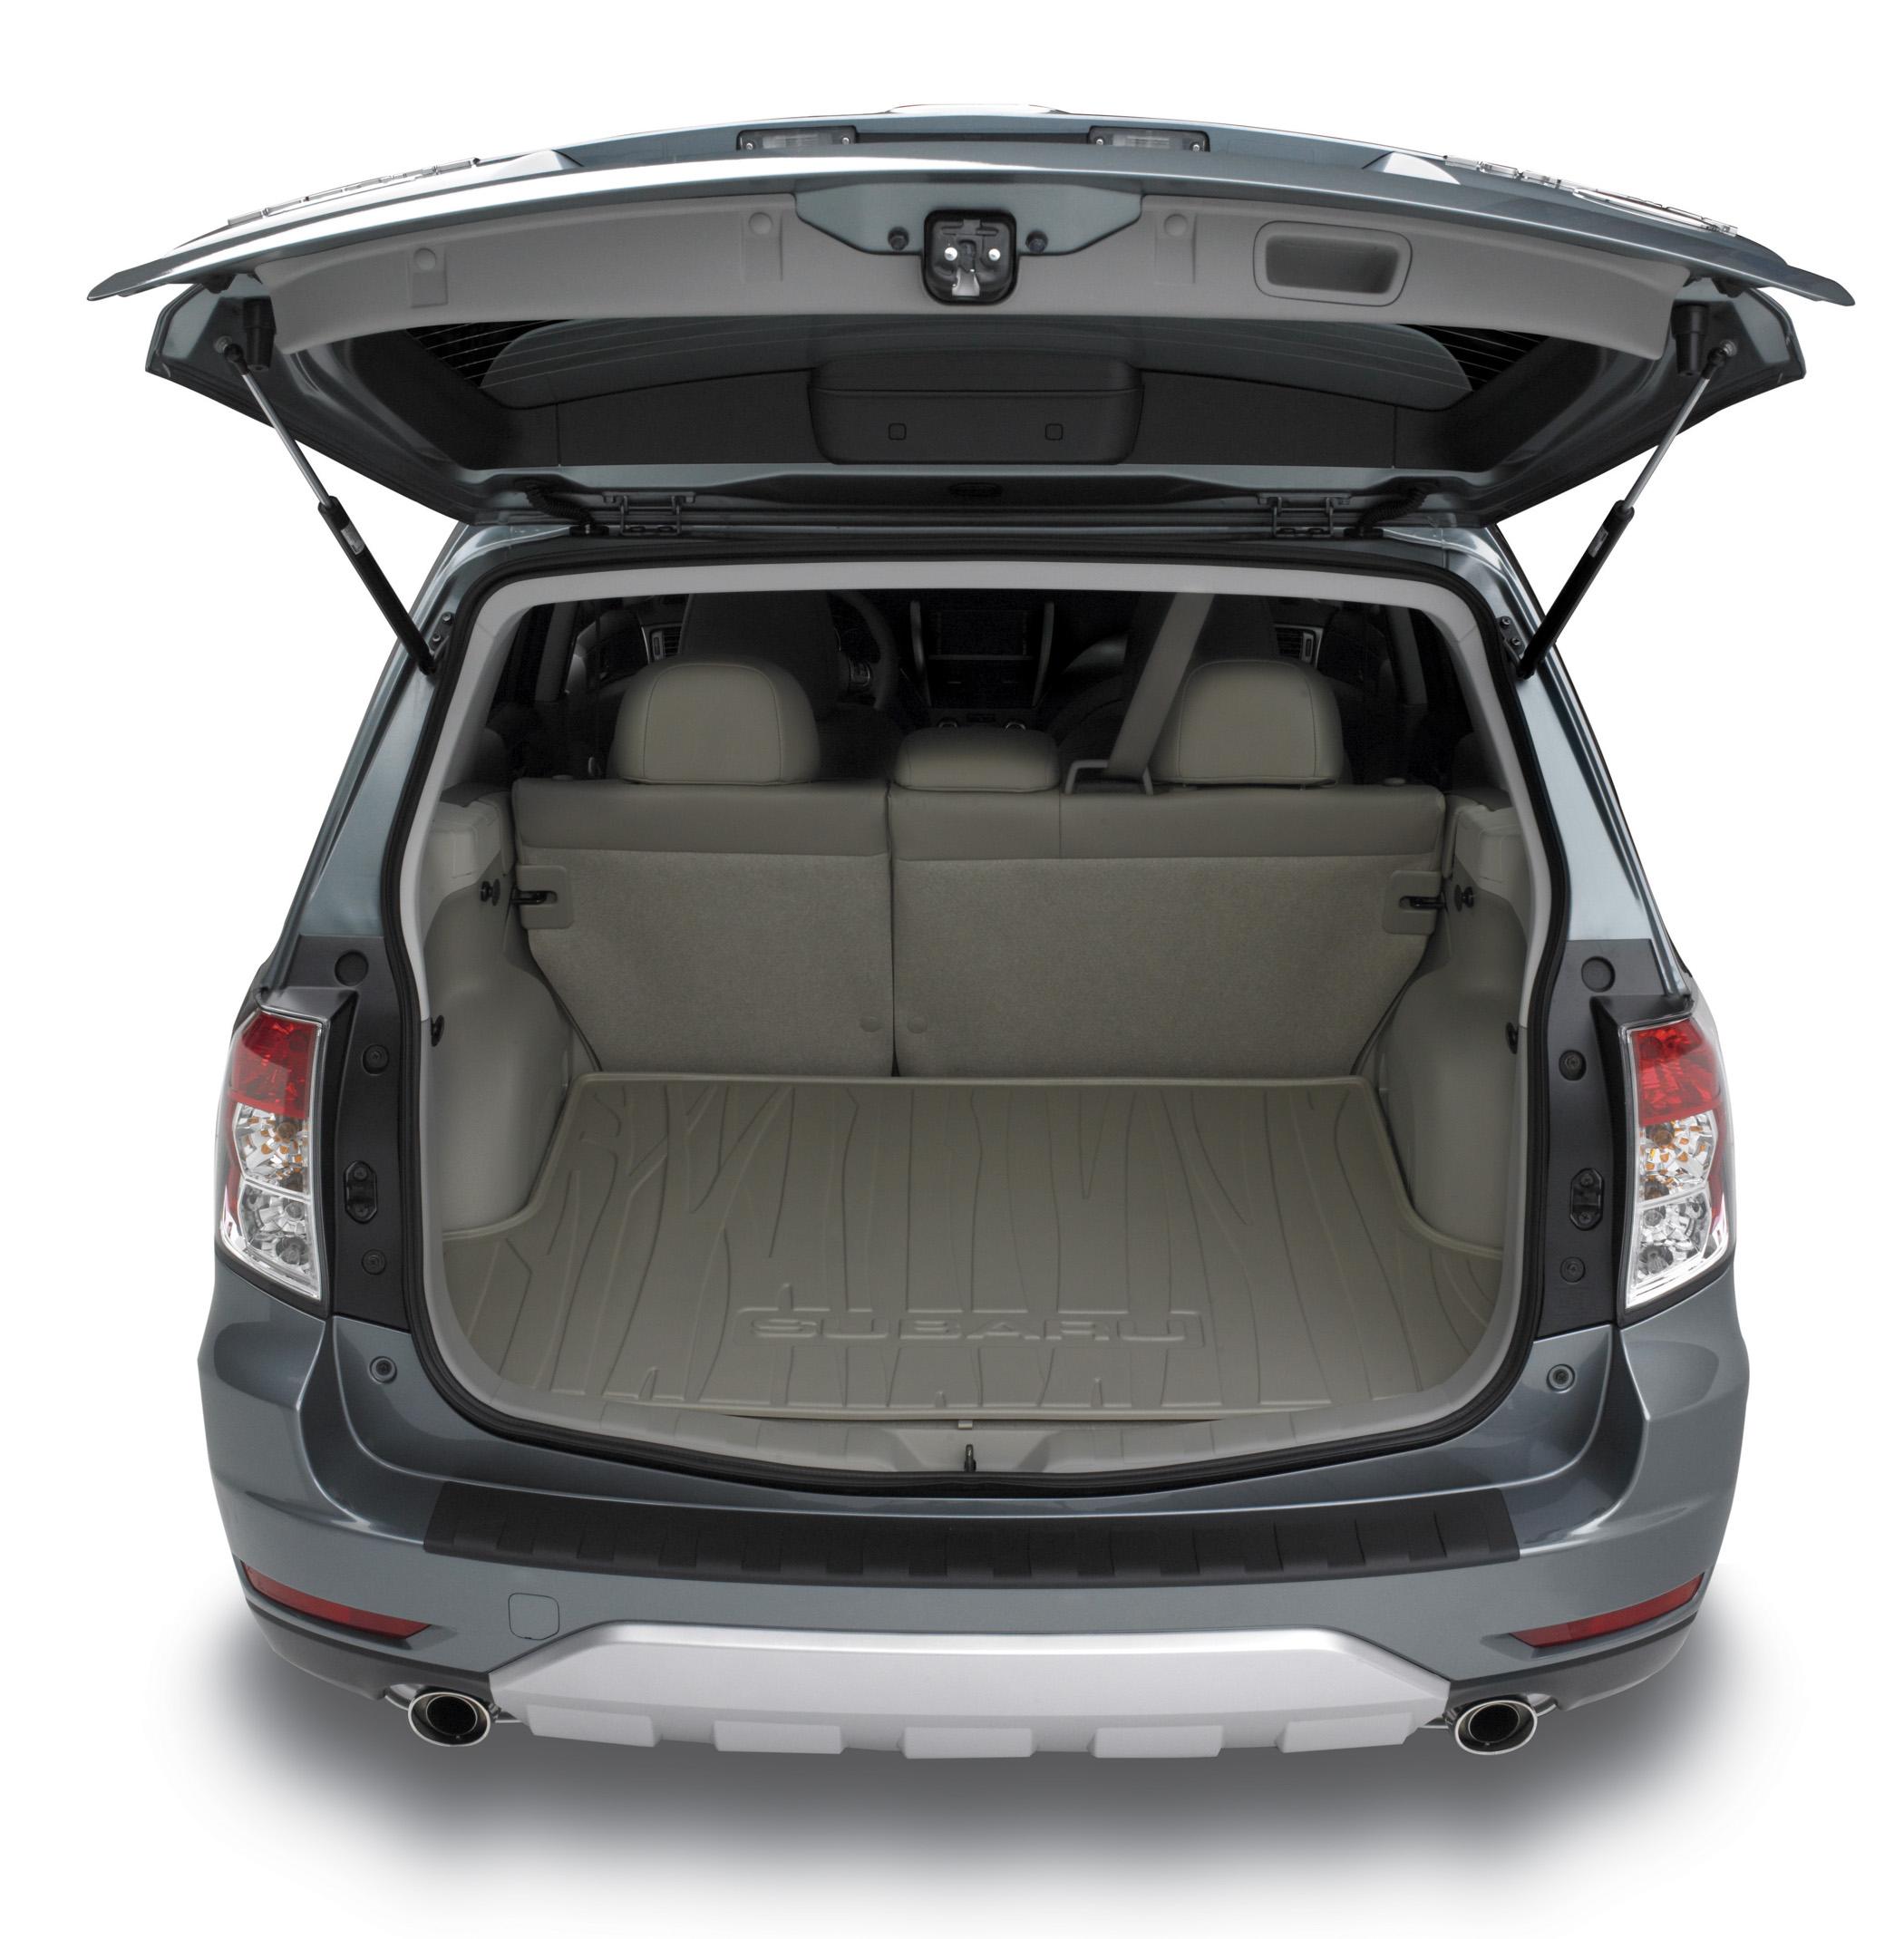 J501ssc000ap Subaru Cargo Tray Platinum Interior